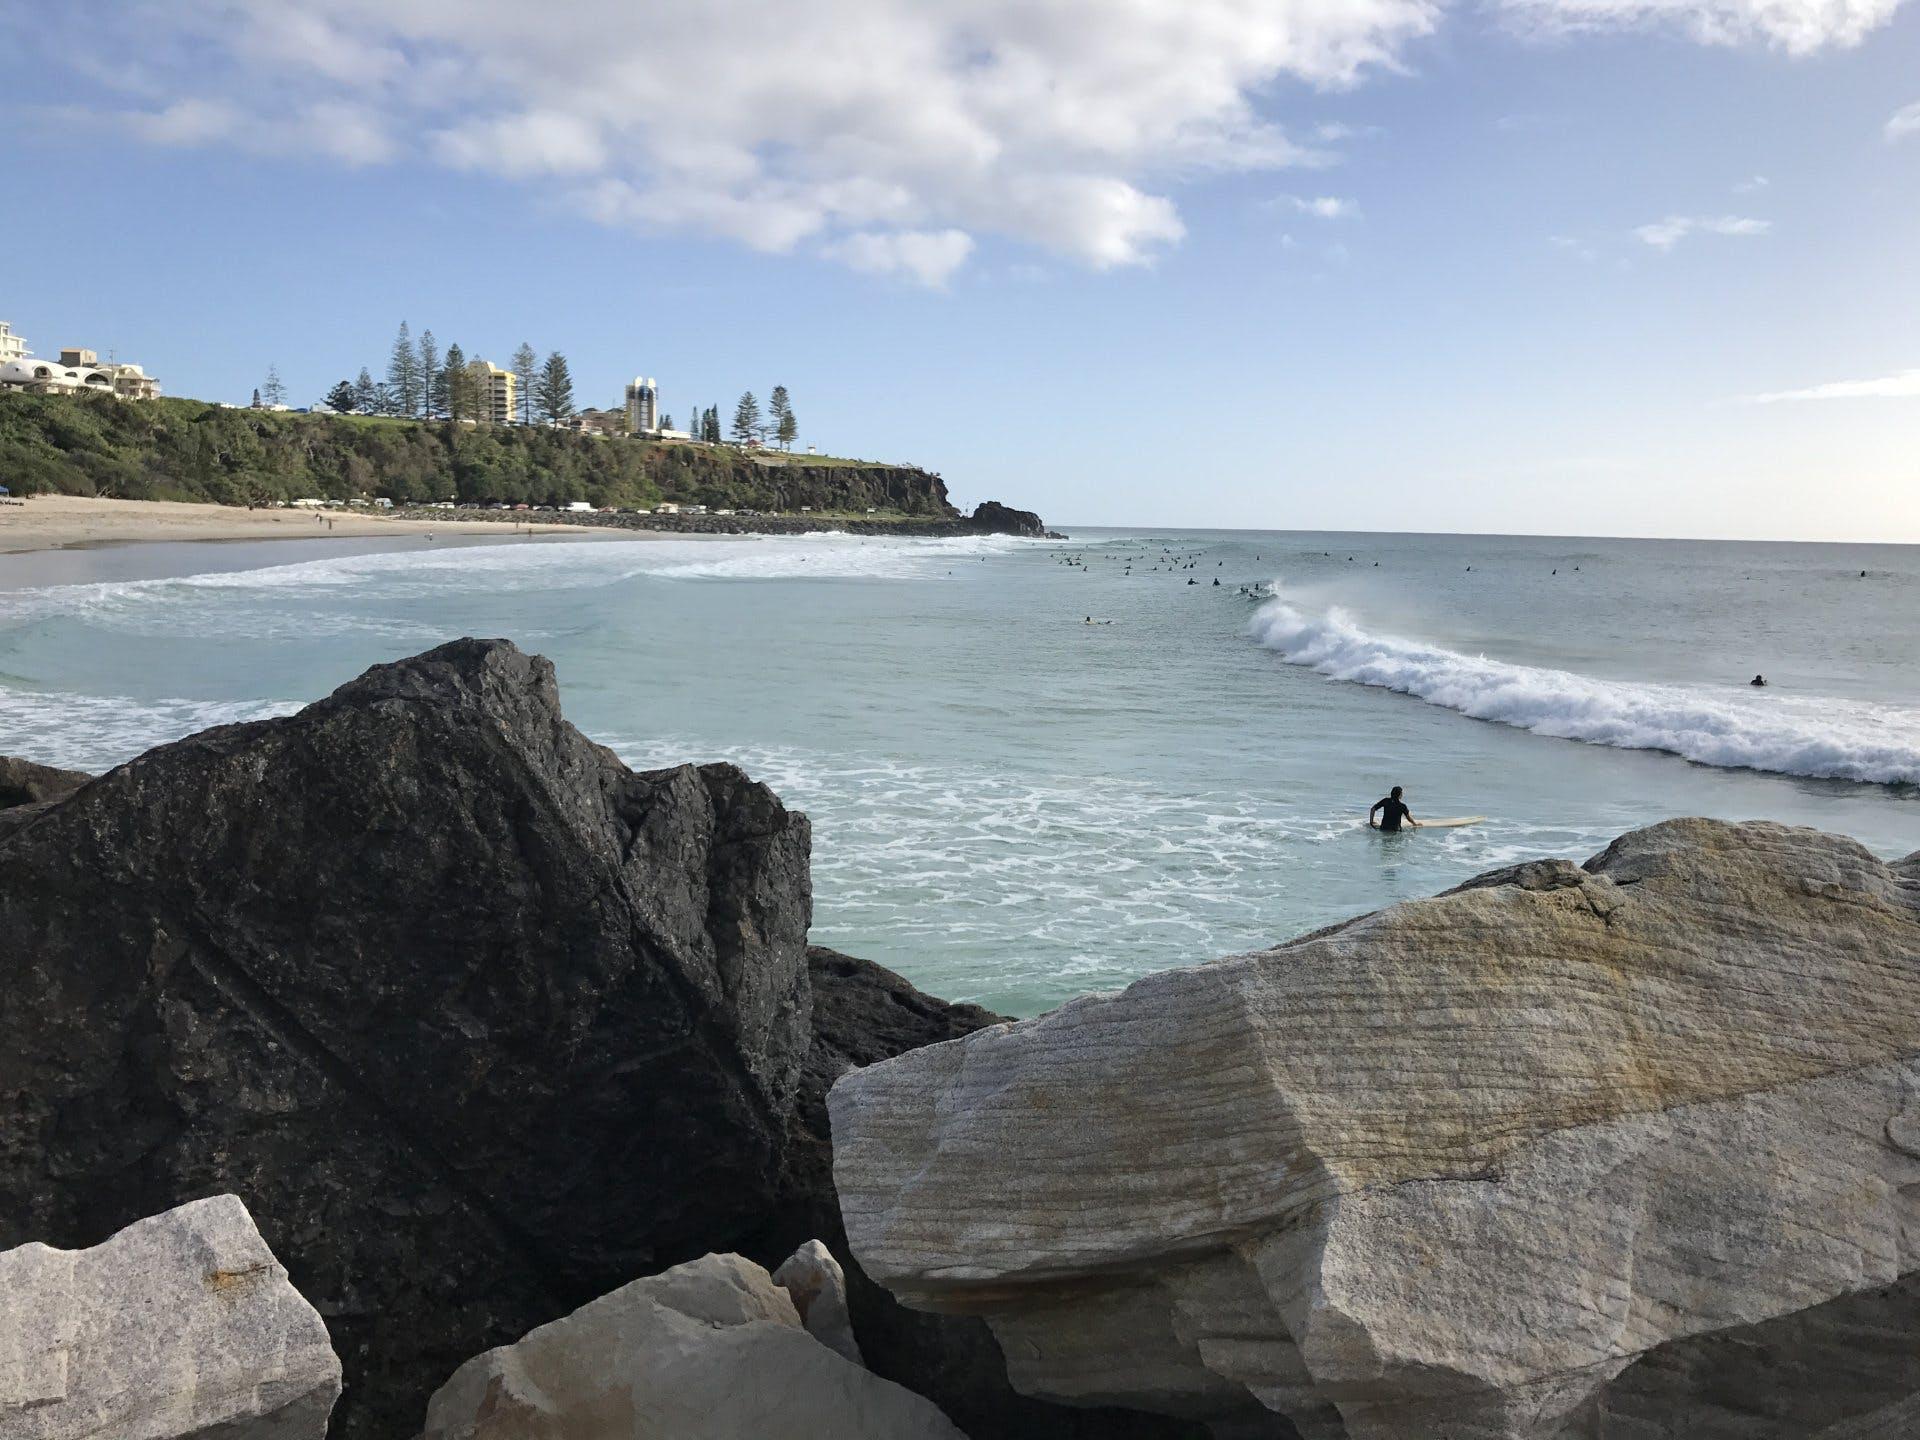 Tweed Heads - Duranbah Beach, looking up to Point Danger